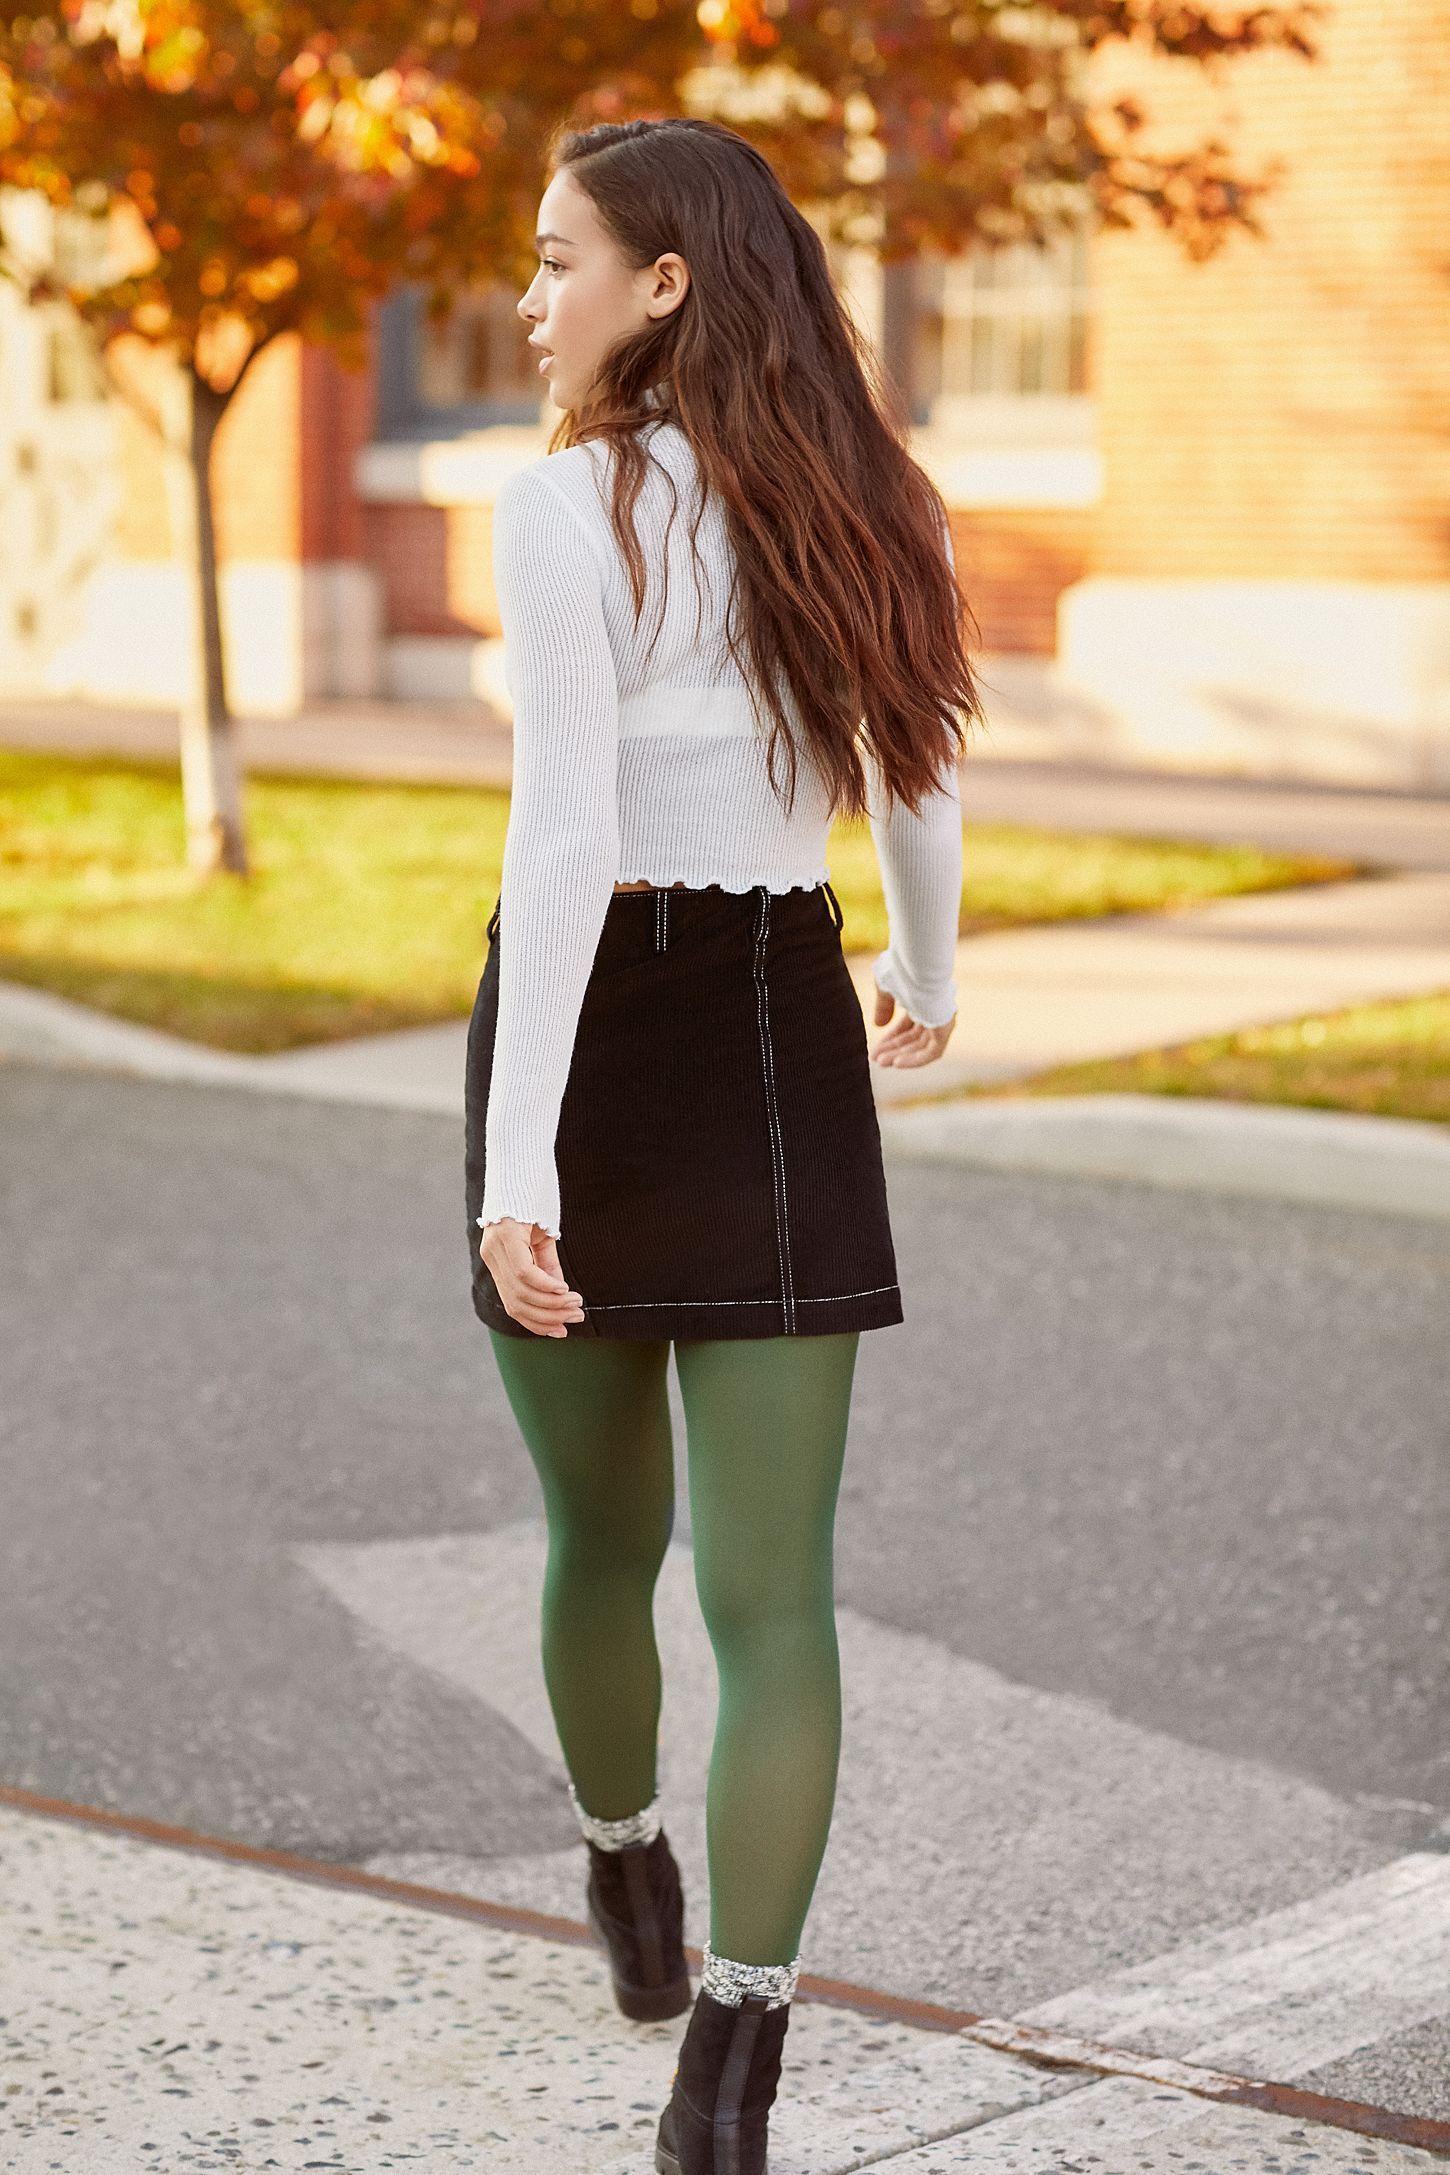 Bdg Avery Corduroy Button Front Mini Skirt Mini Skirts Green